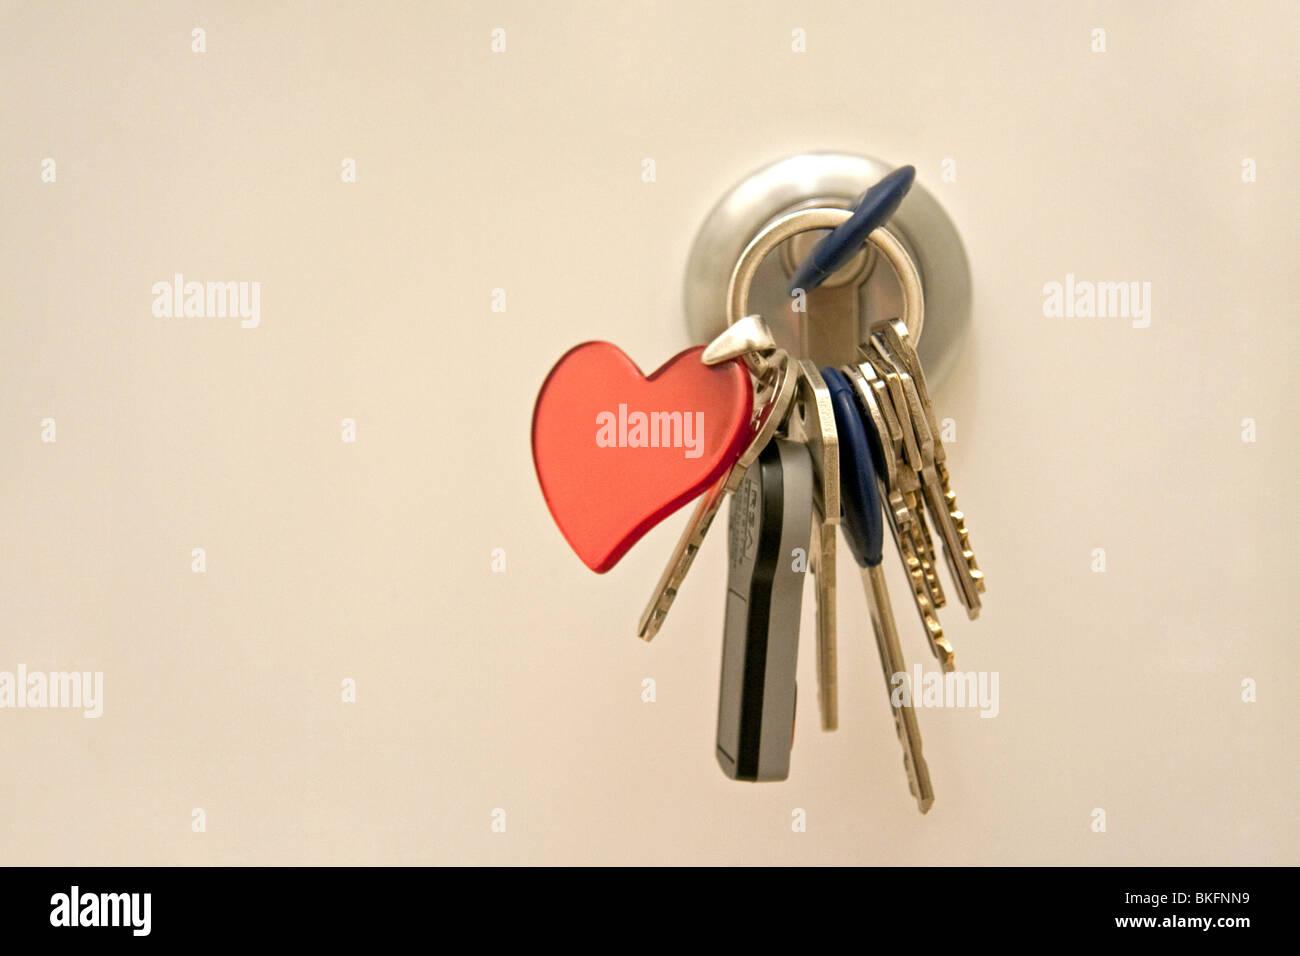 Door lock with key chain - Stock Image